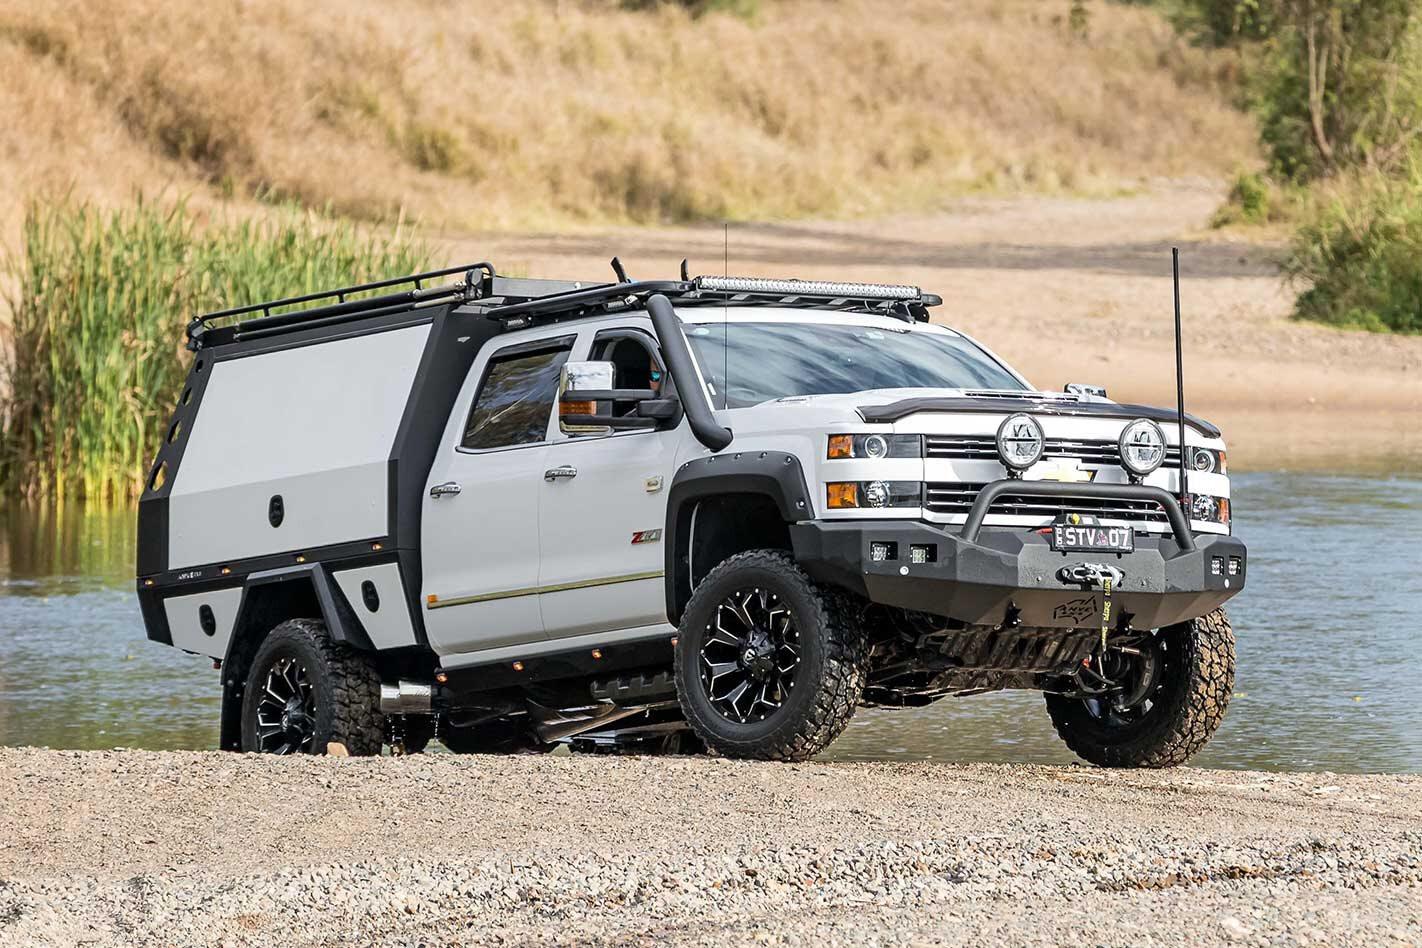 2019 Silverado 2500 LTZ custom 4x4